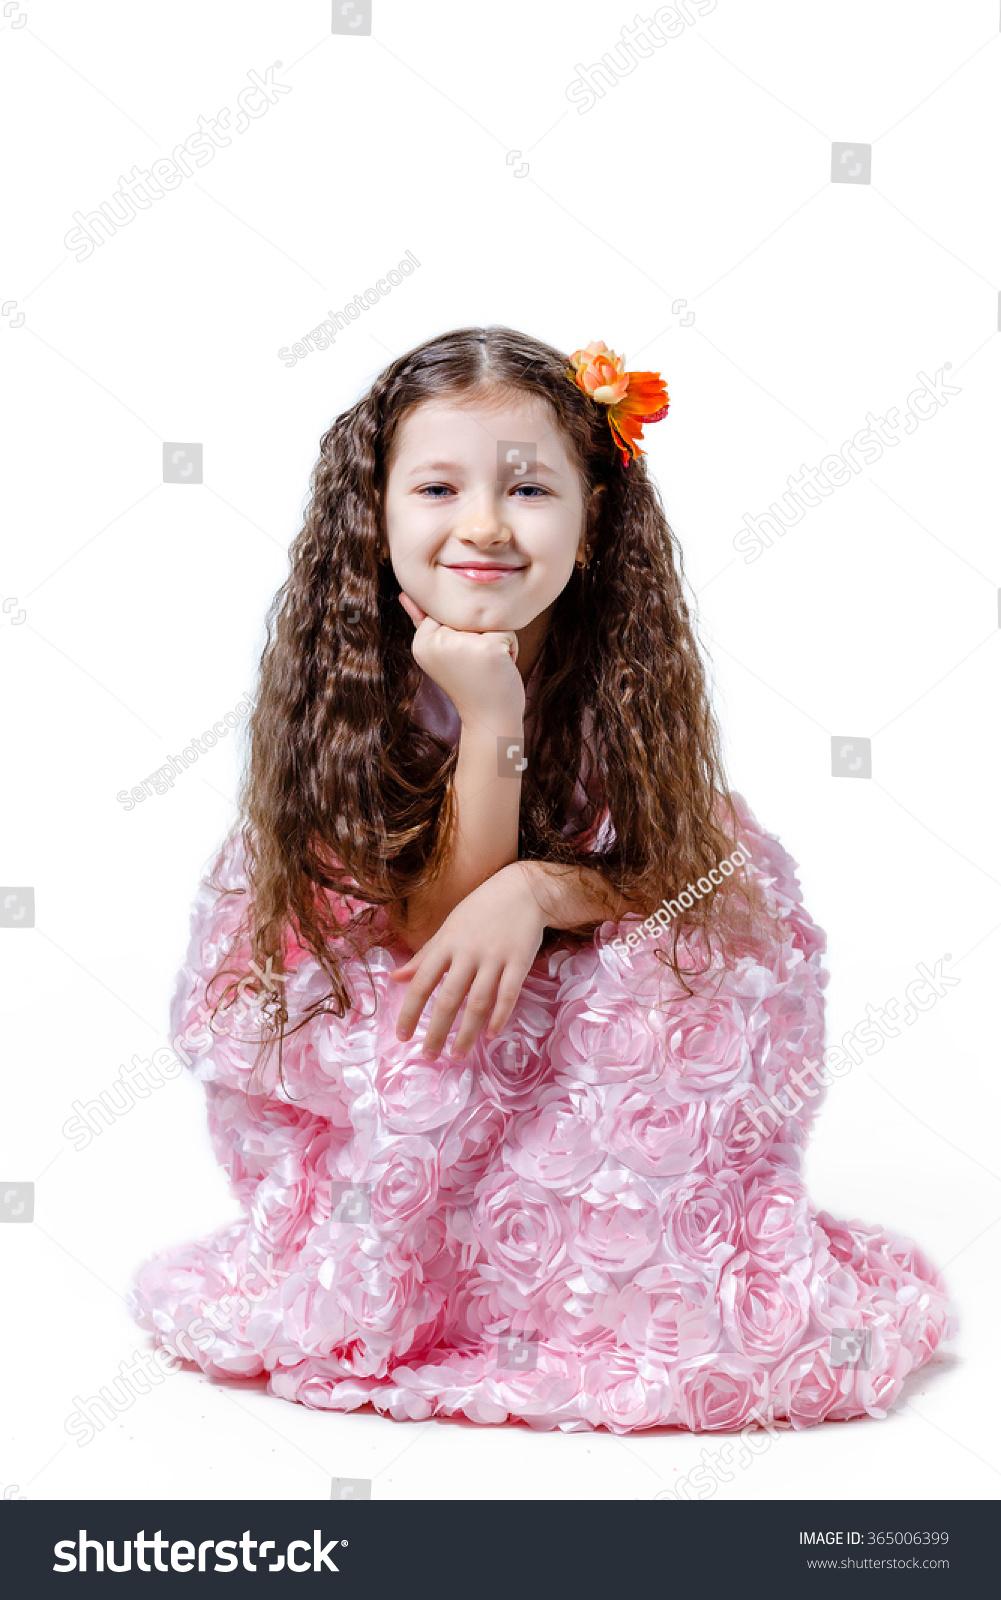 Thailand beautiful girl image-7816